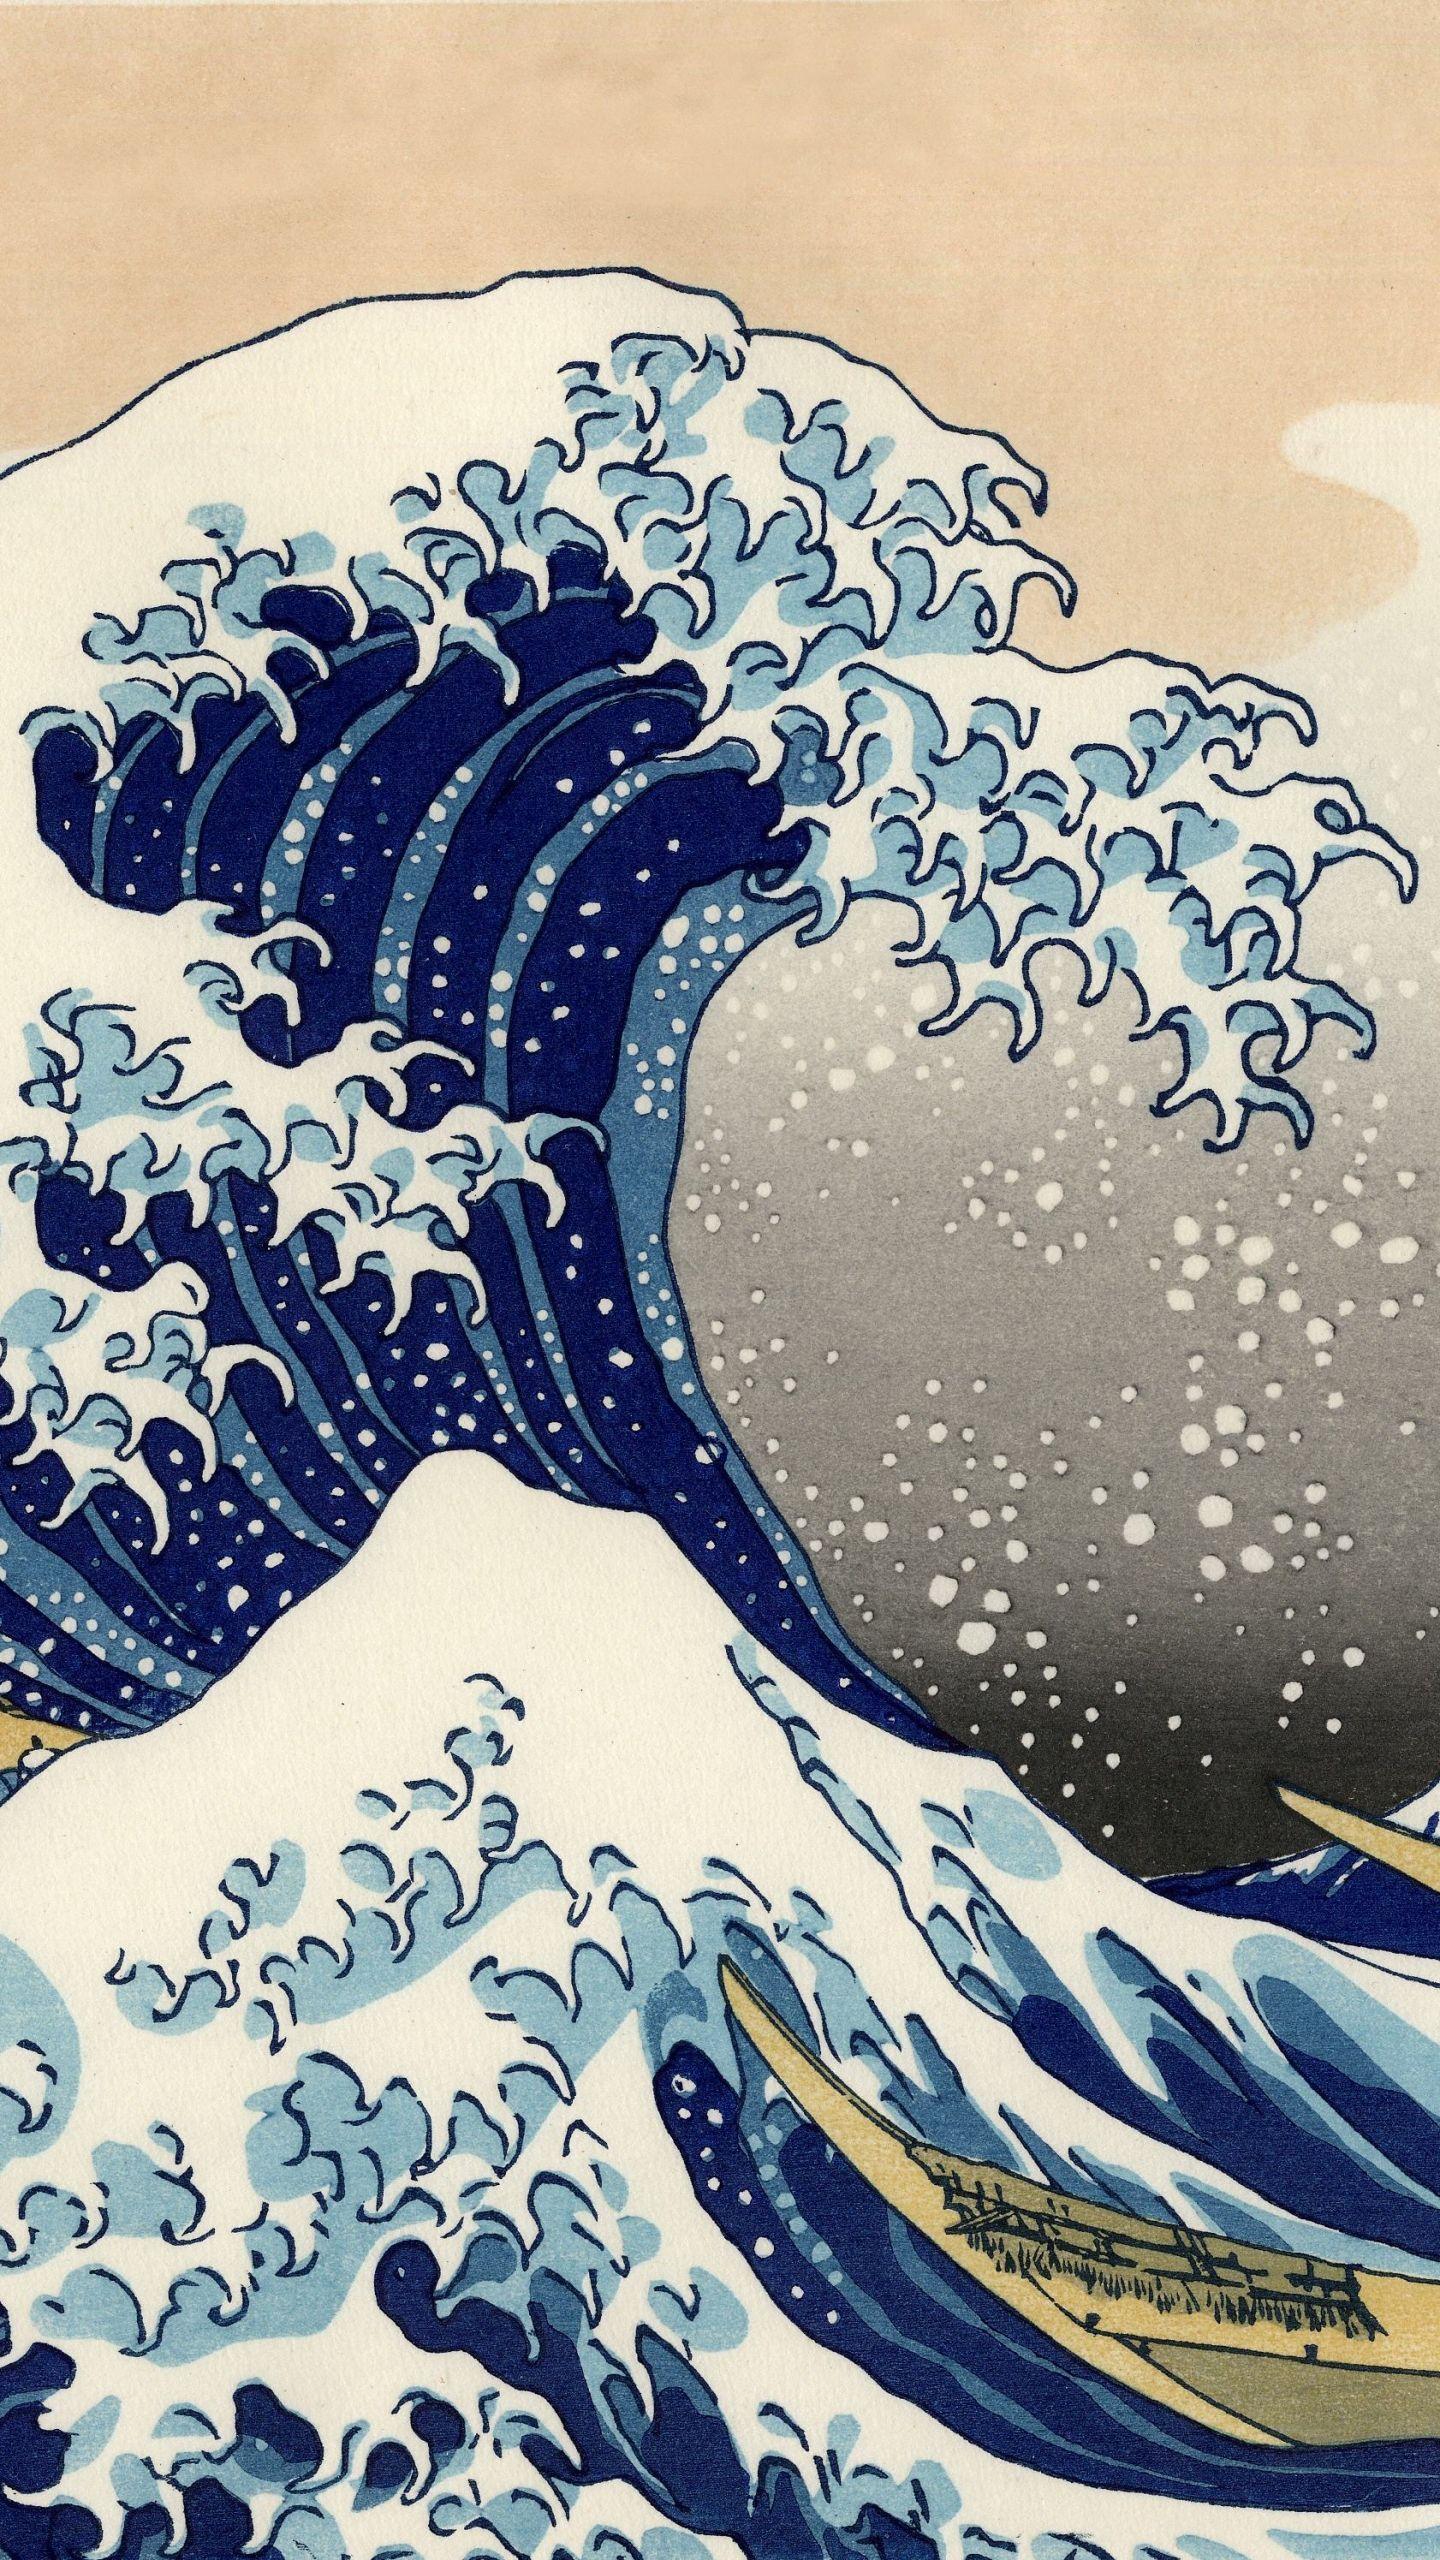 Aesthetic Wave Wallpaper : aesthetic, wallpaper, Iphone, Wallpaper, Japanese